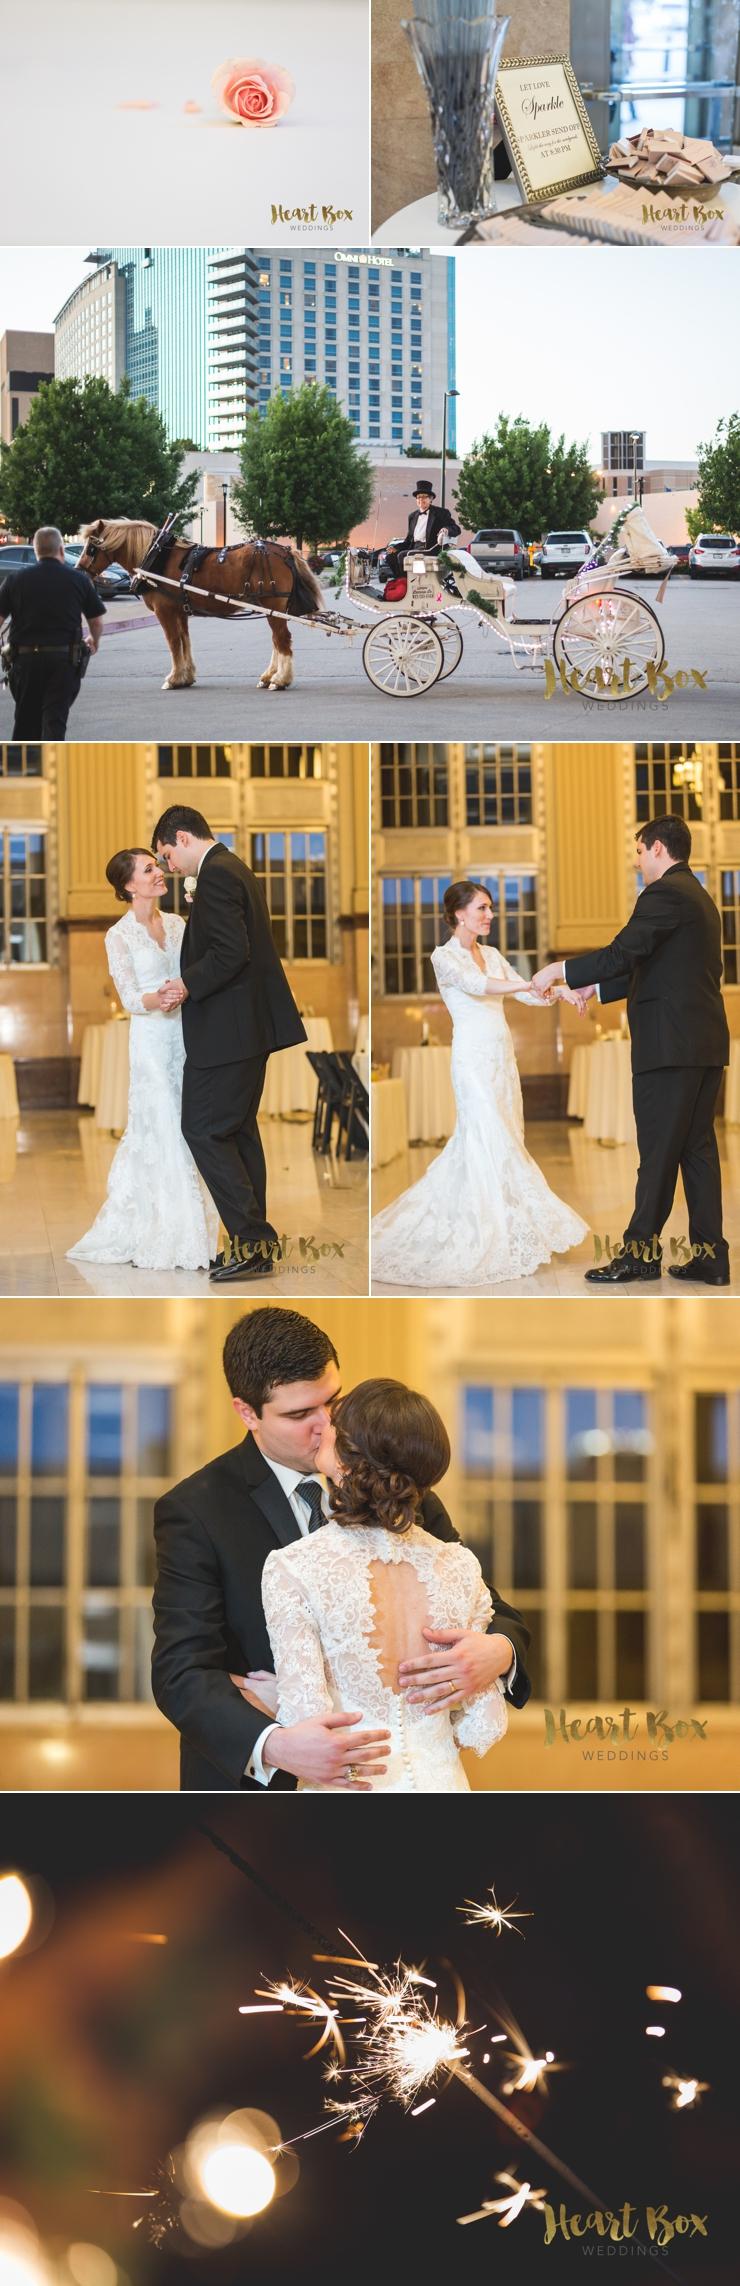 Fegan Wedding Blog Collages 20.jpg